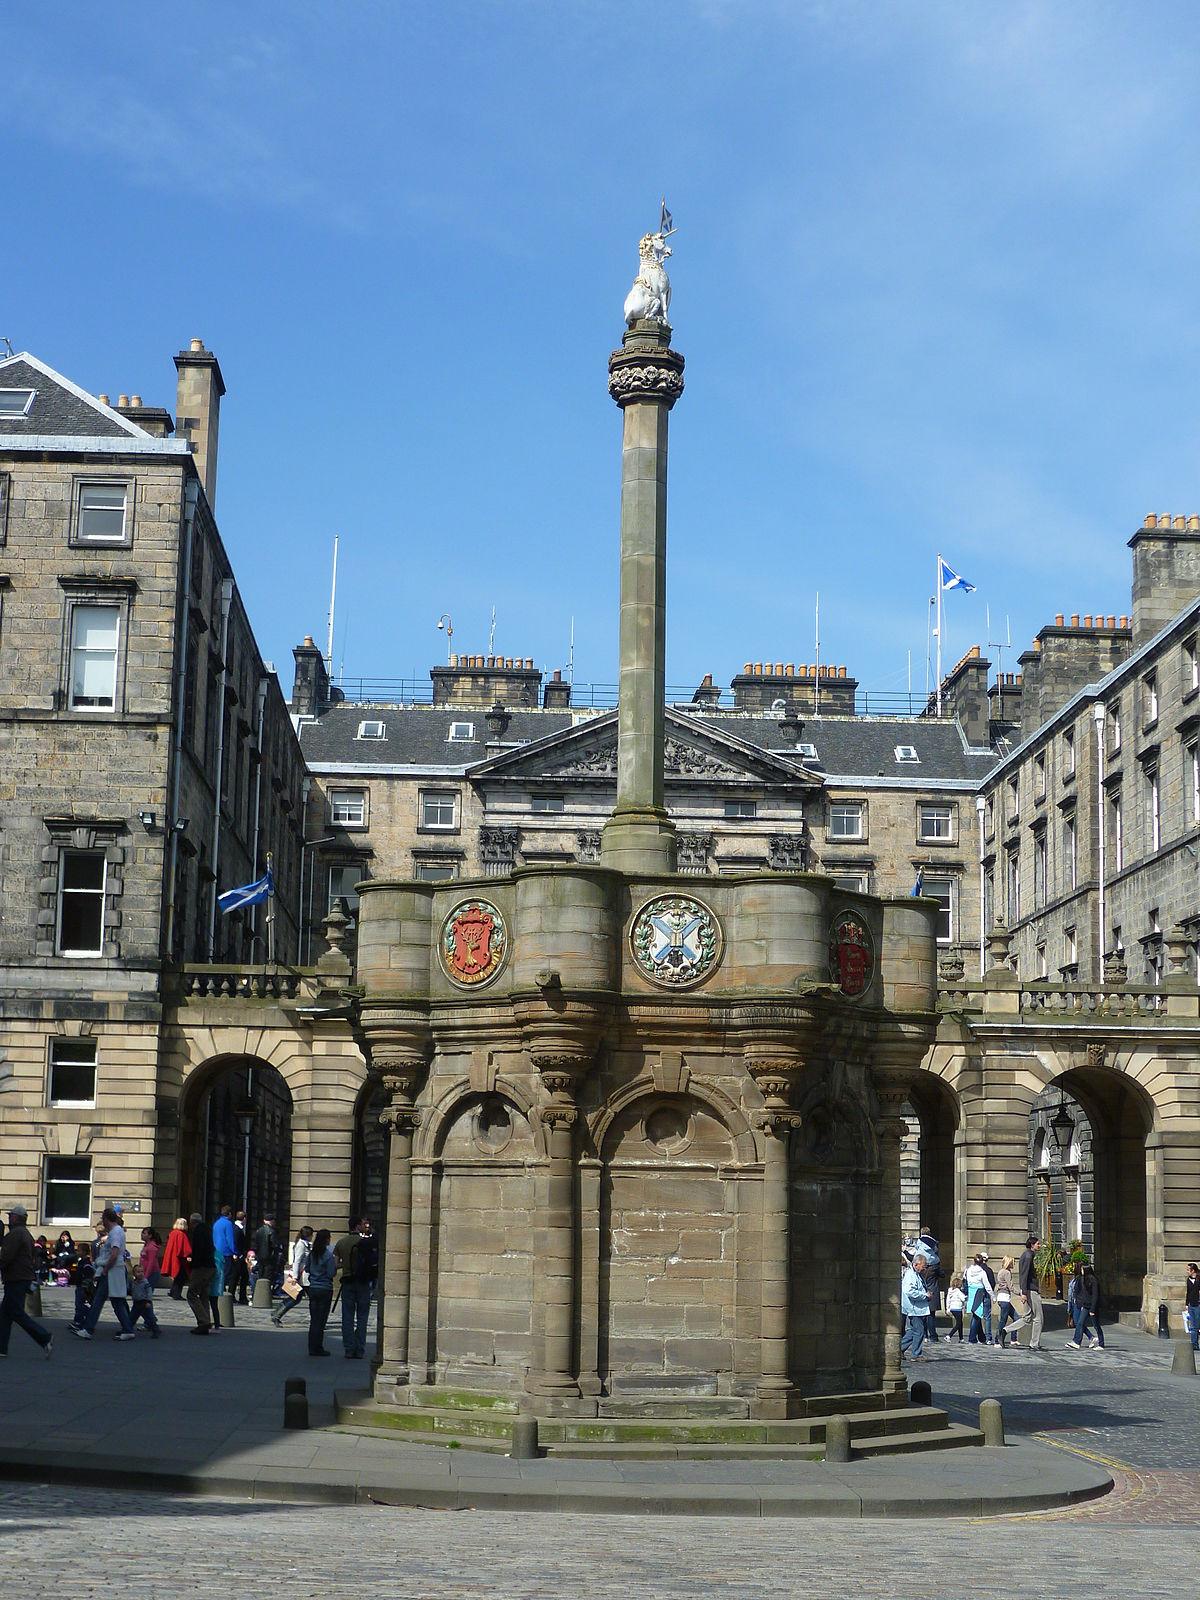 Mercat Cross, Edinburgh - Wikipedia